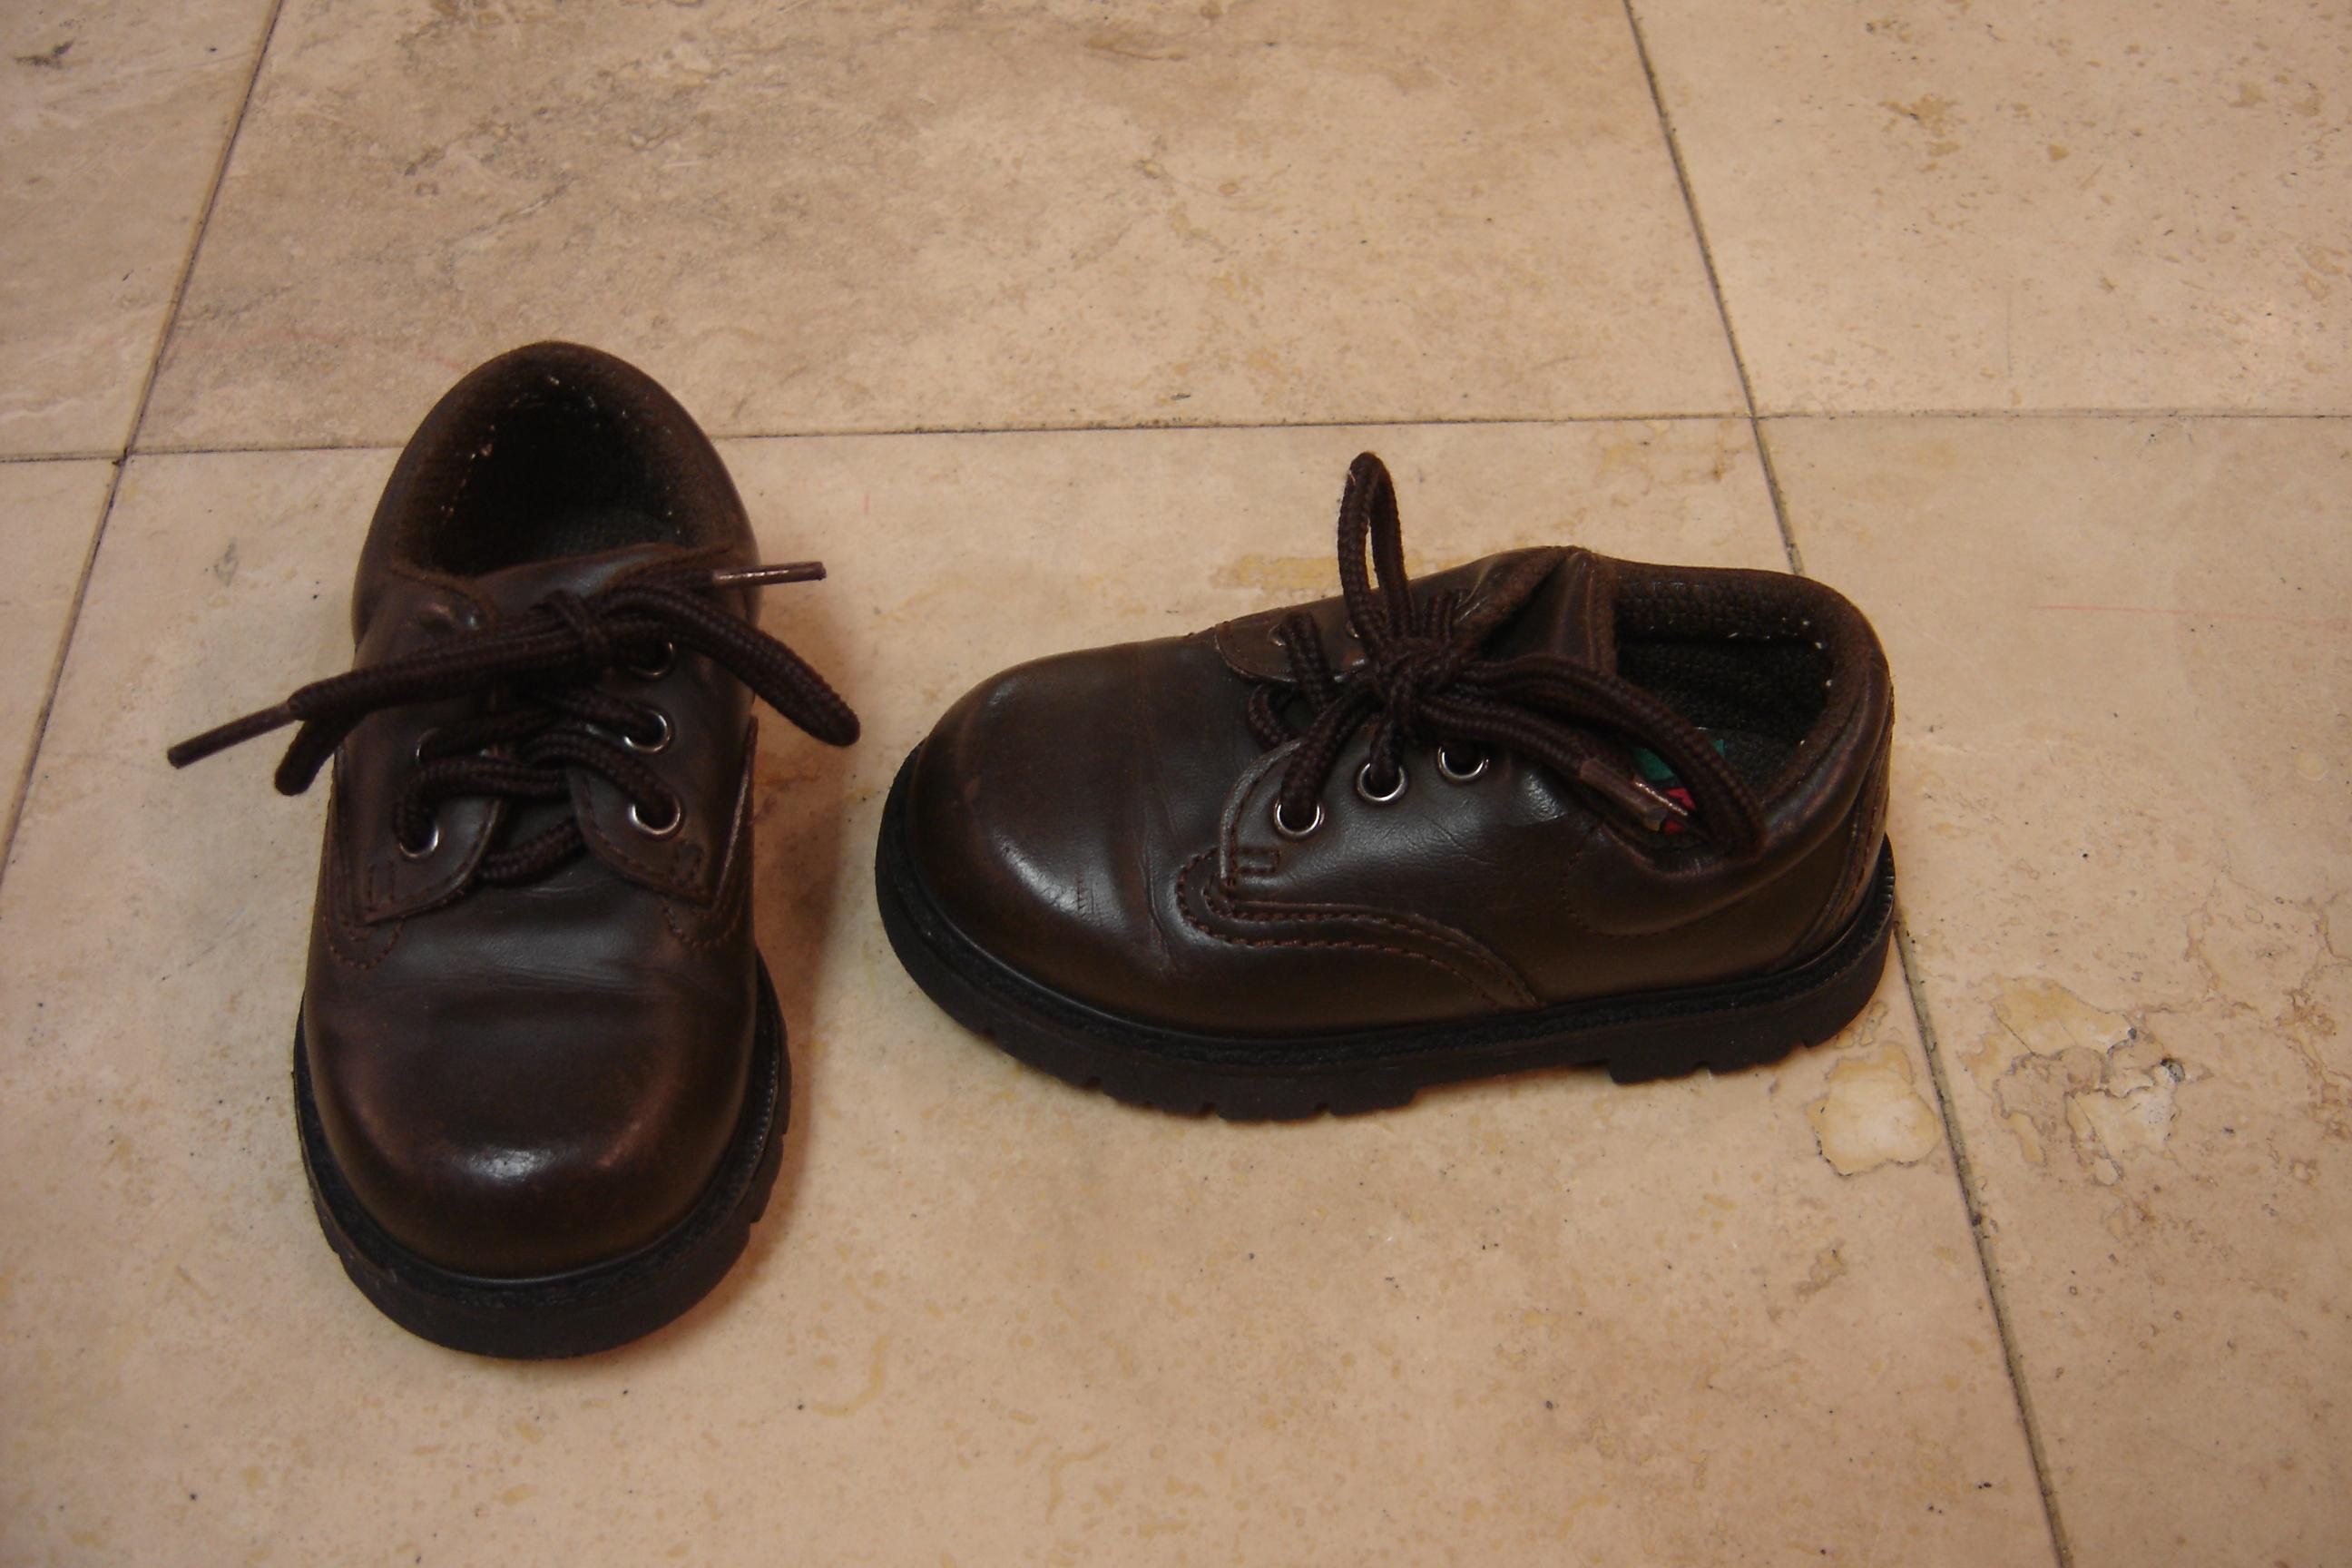 Munchkin Boys Toddler Kids Size 5 5 Dark Brown Lace Loafer Dress